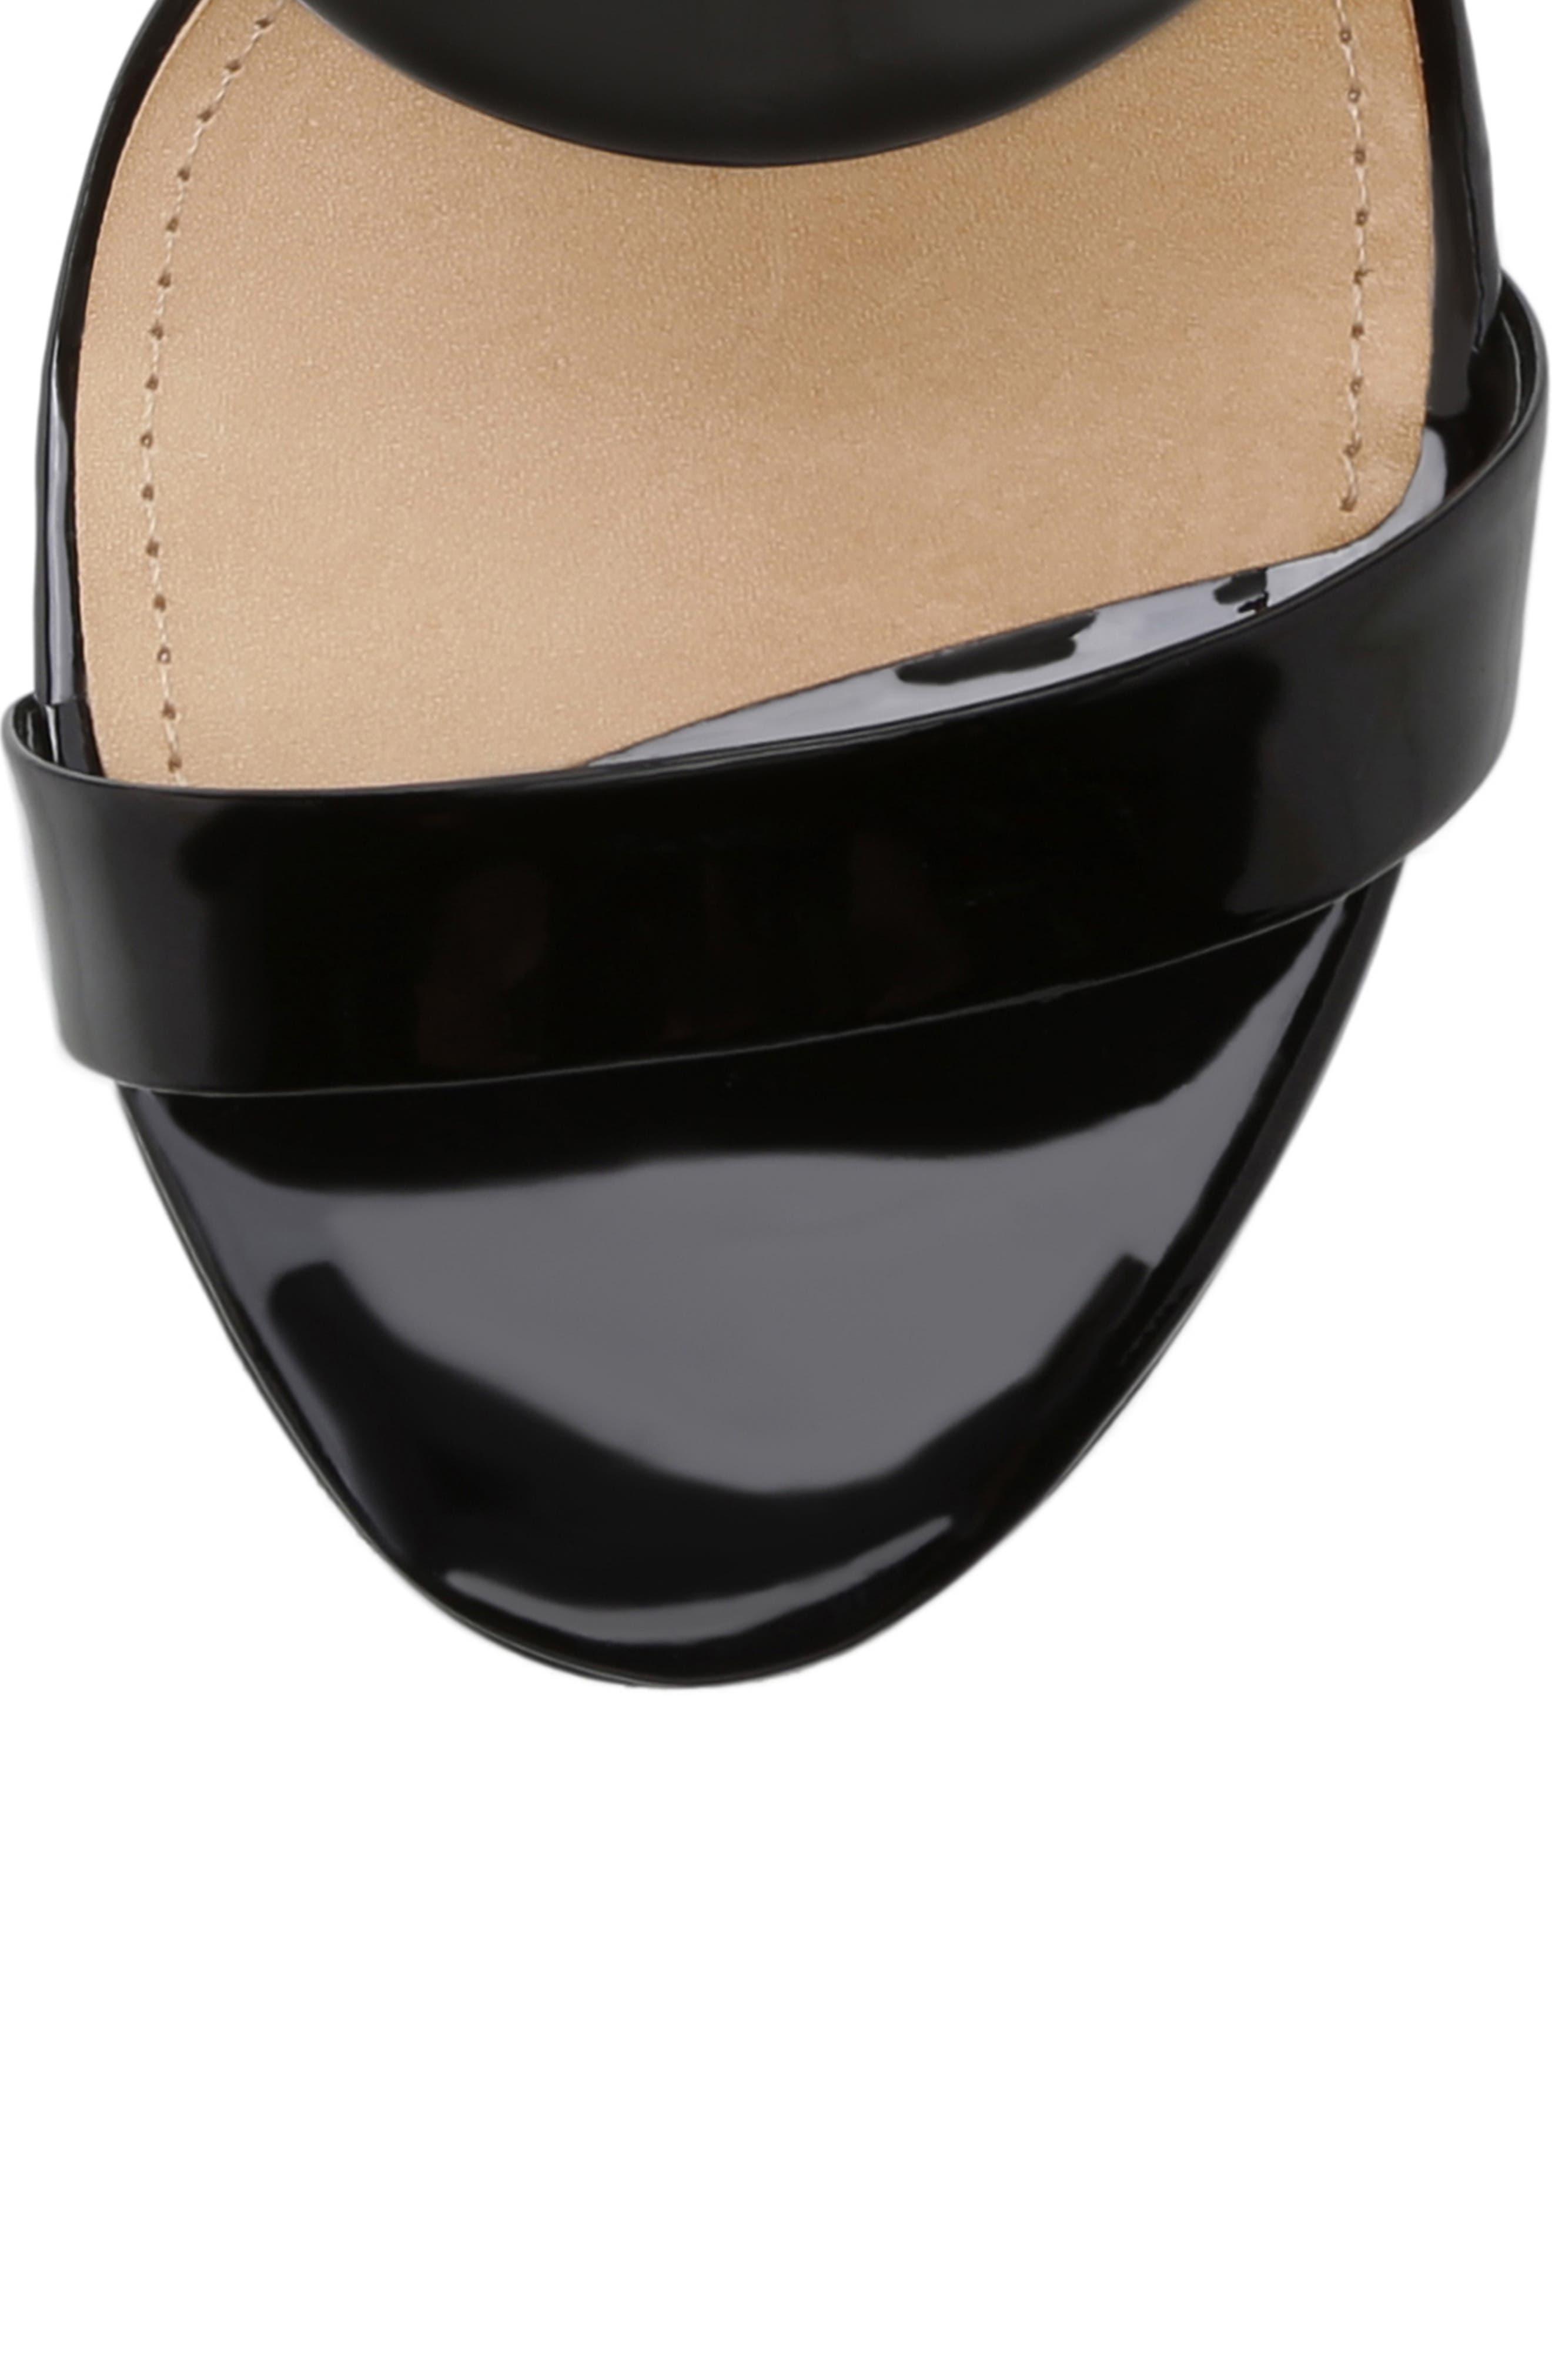 Stiletto Slide Sandal,                             Alternate thumbnail 5, color,                             BLACK PATENT LEATHER